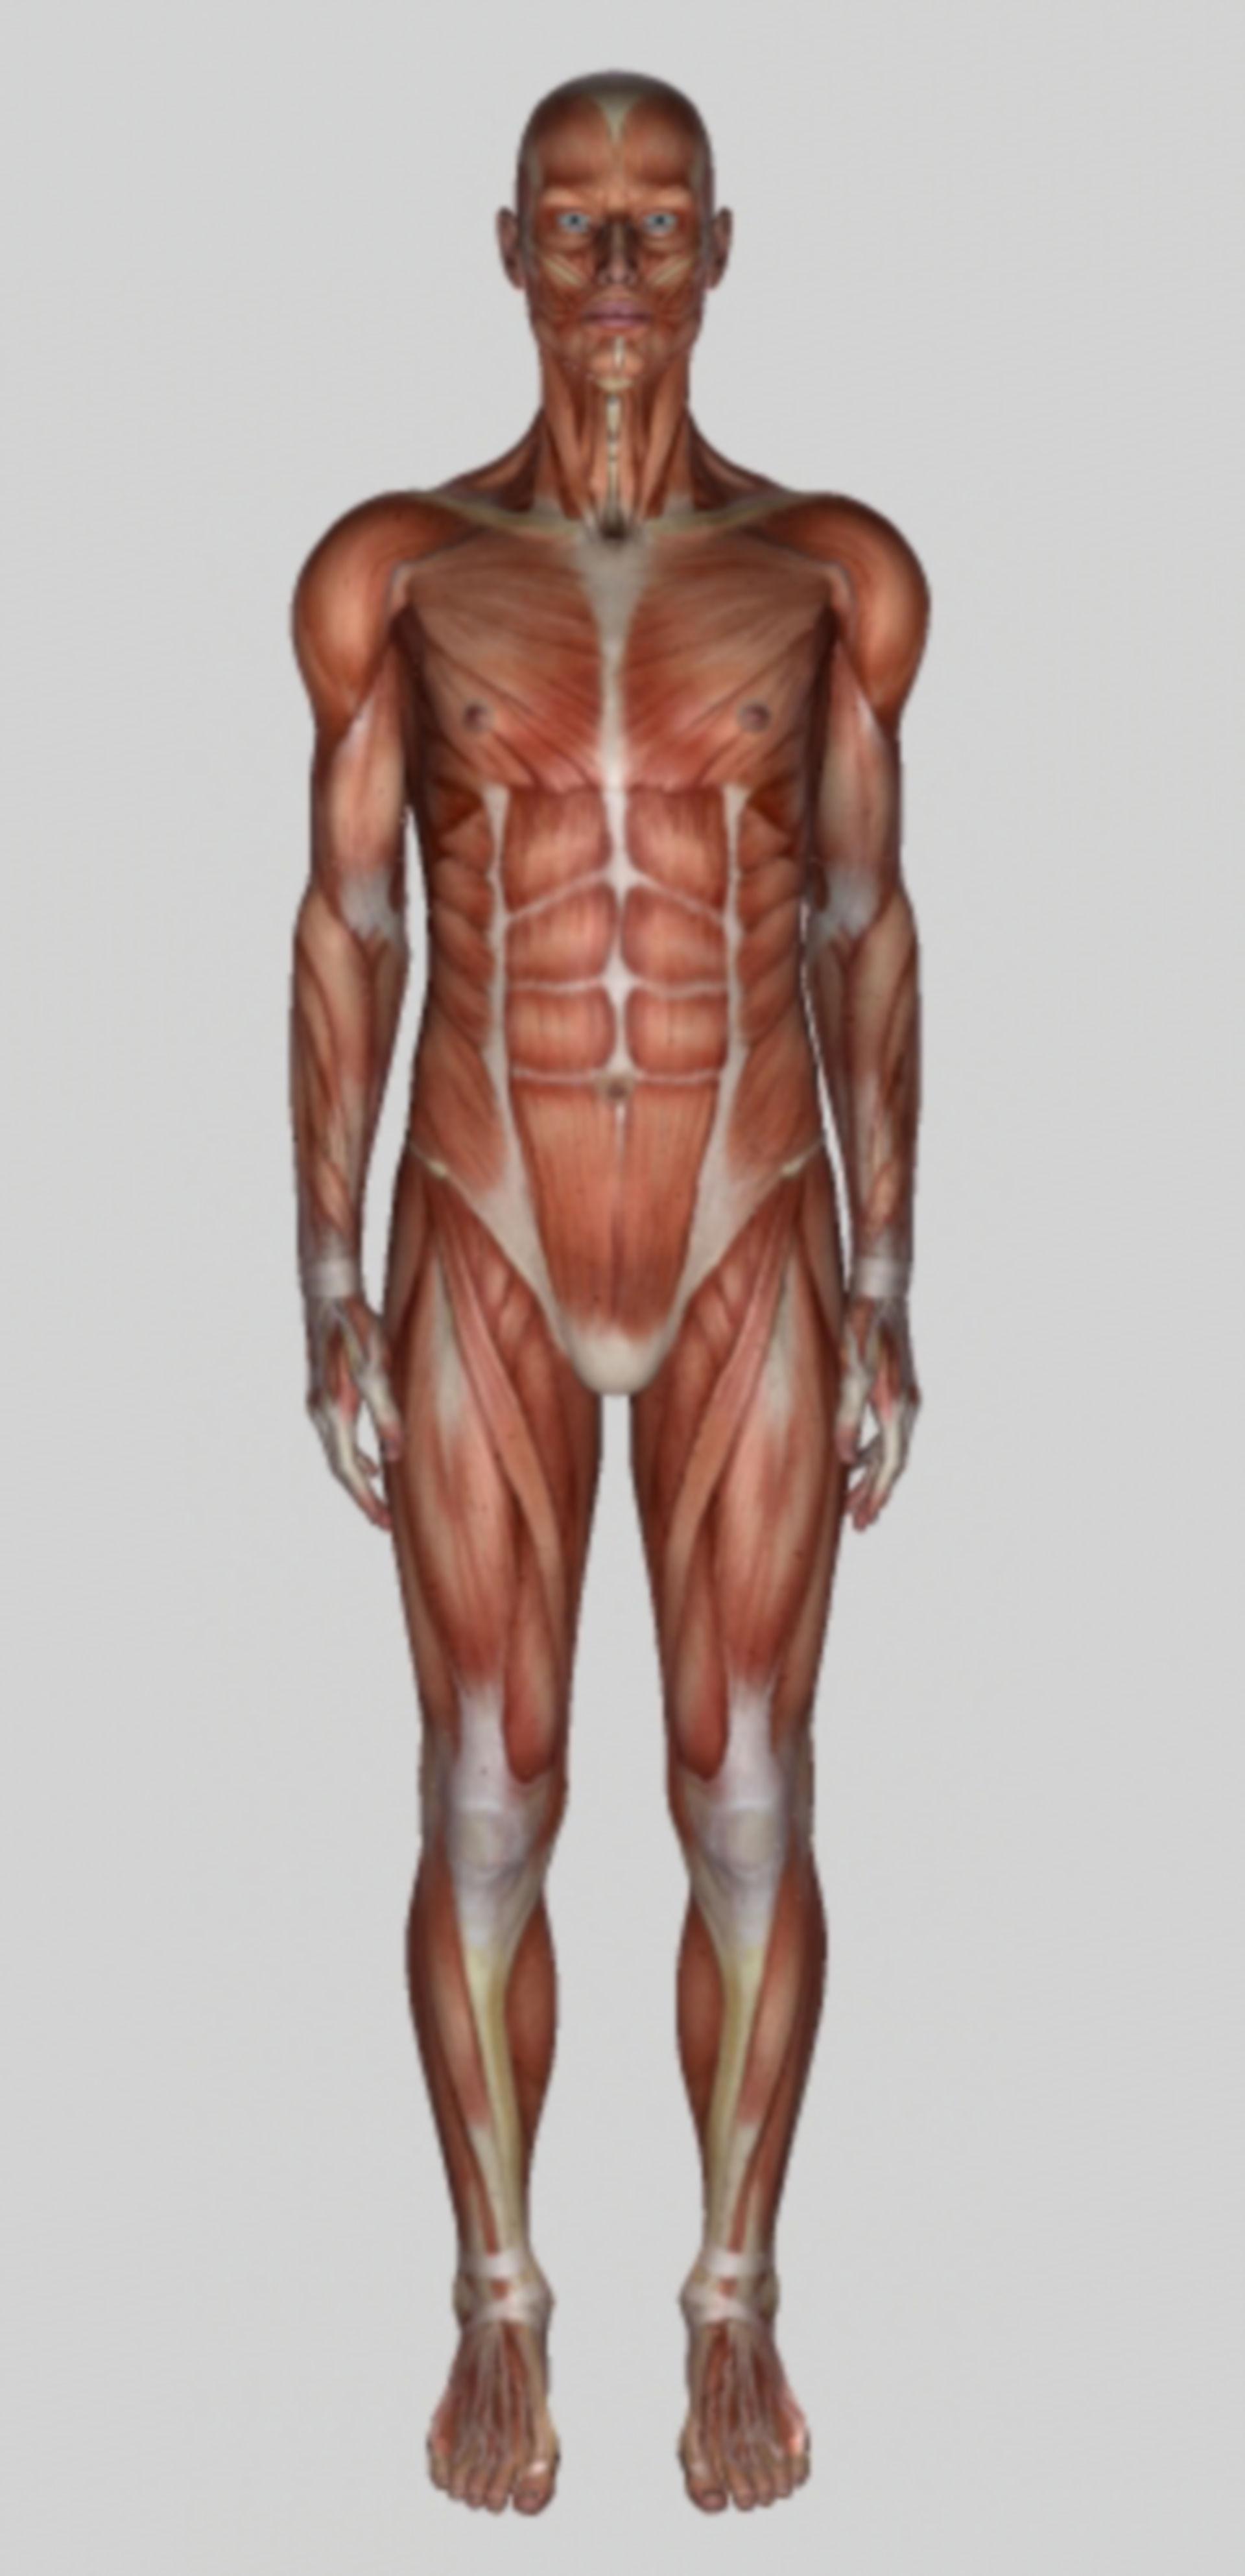 Muskulatur Frontalansicht